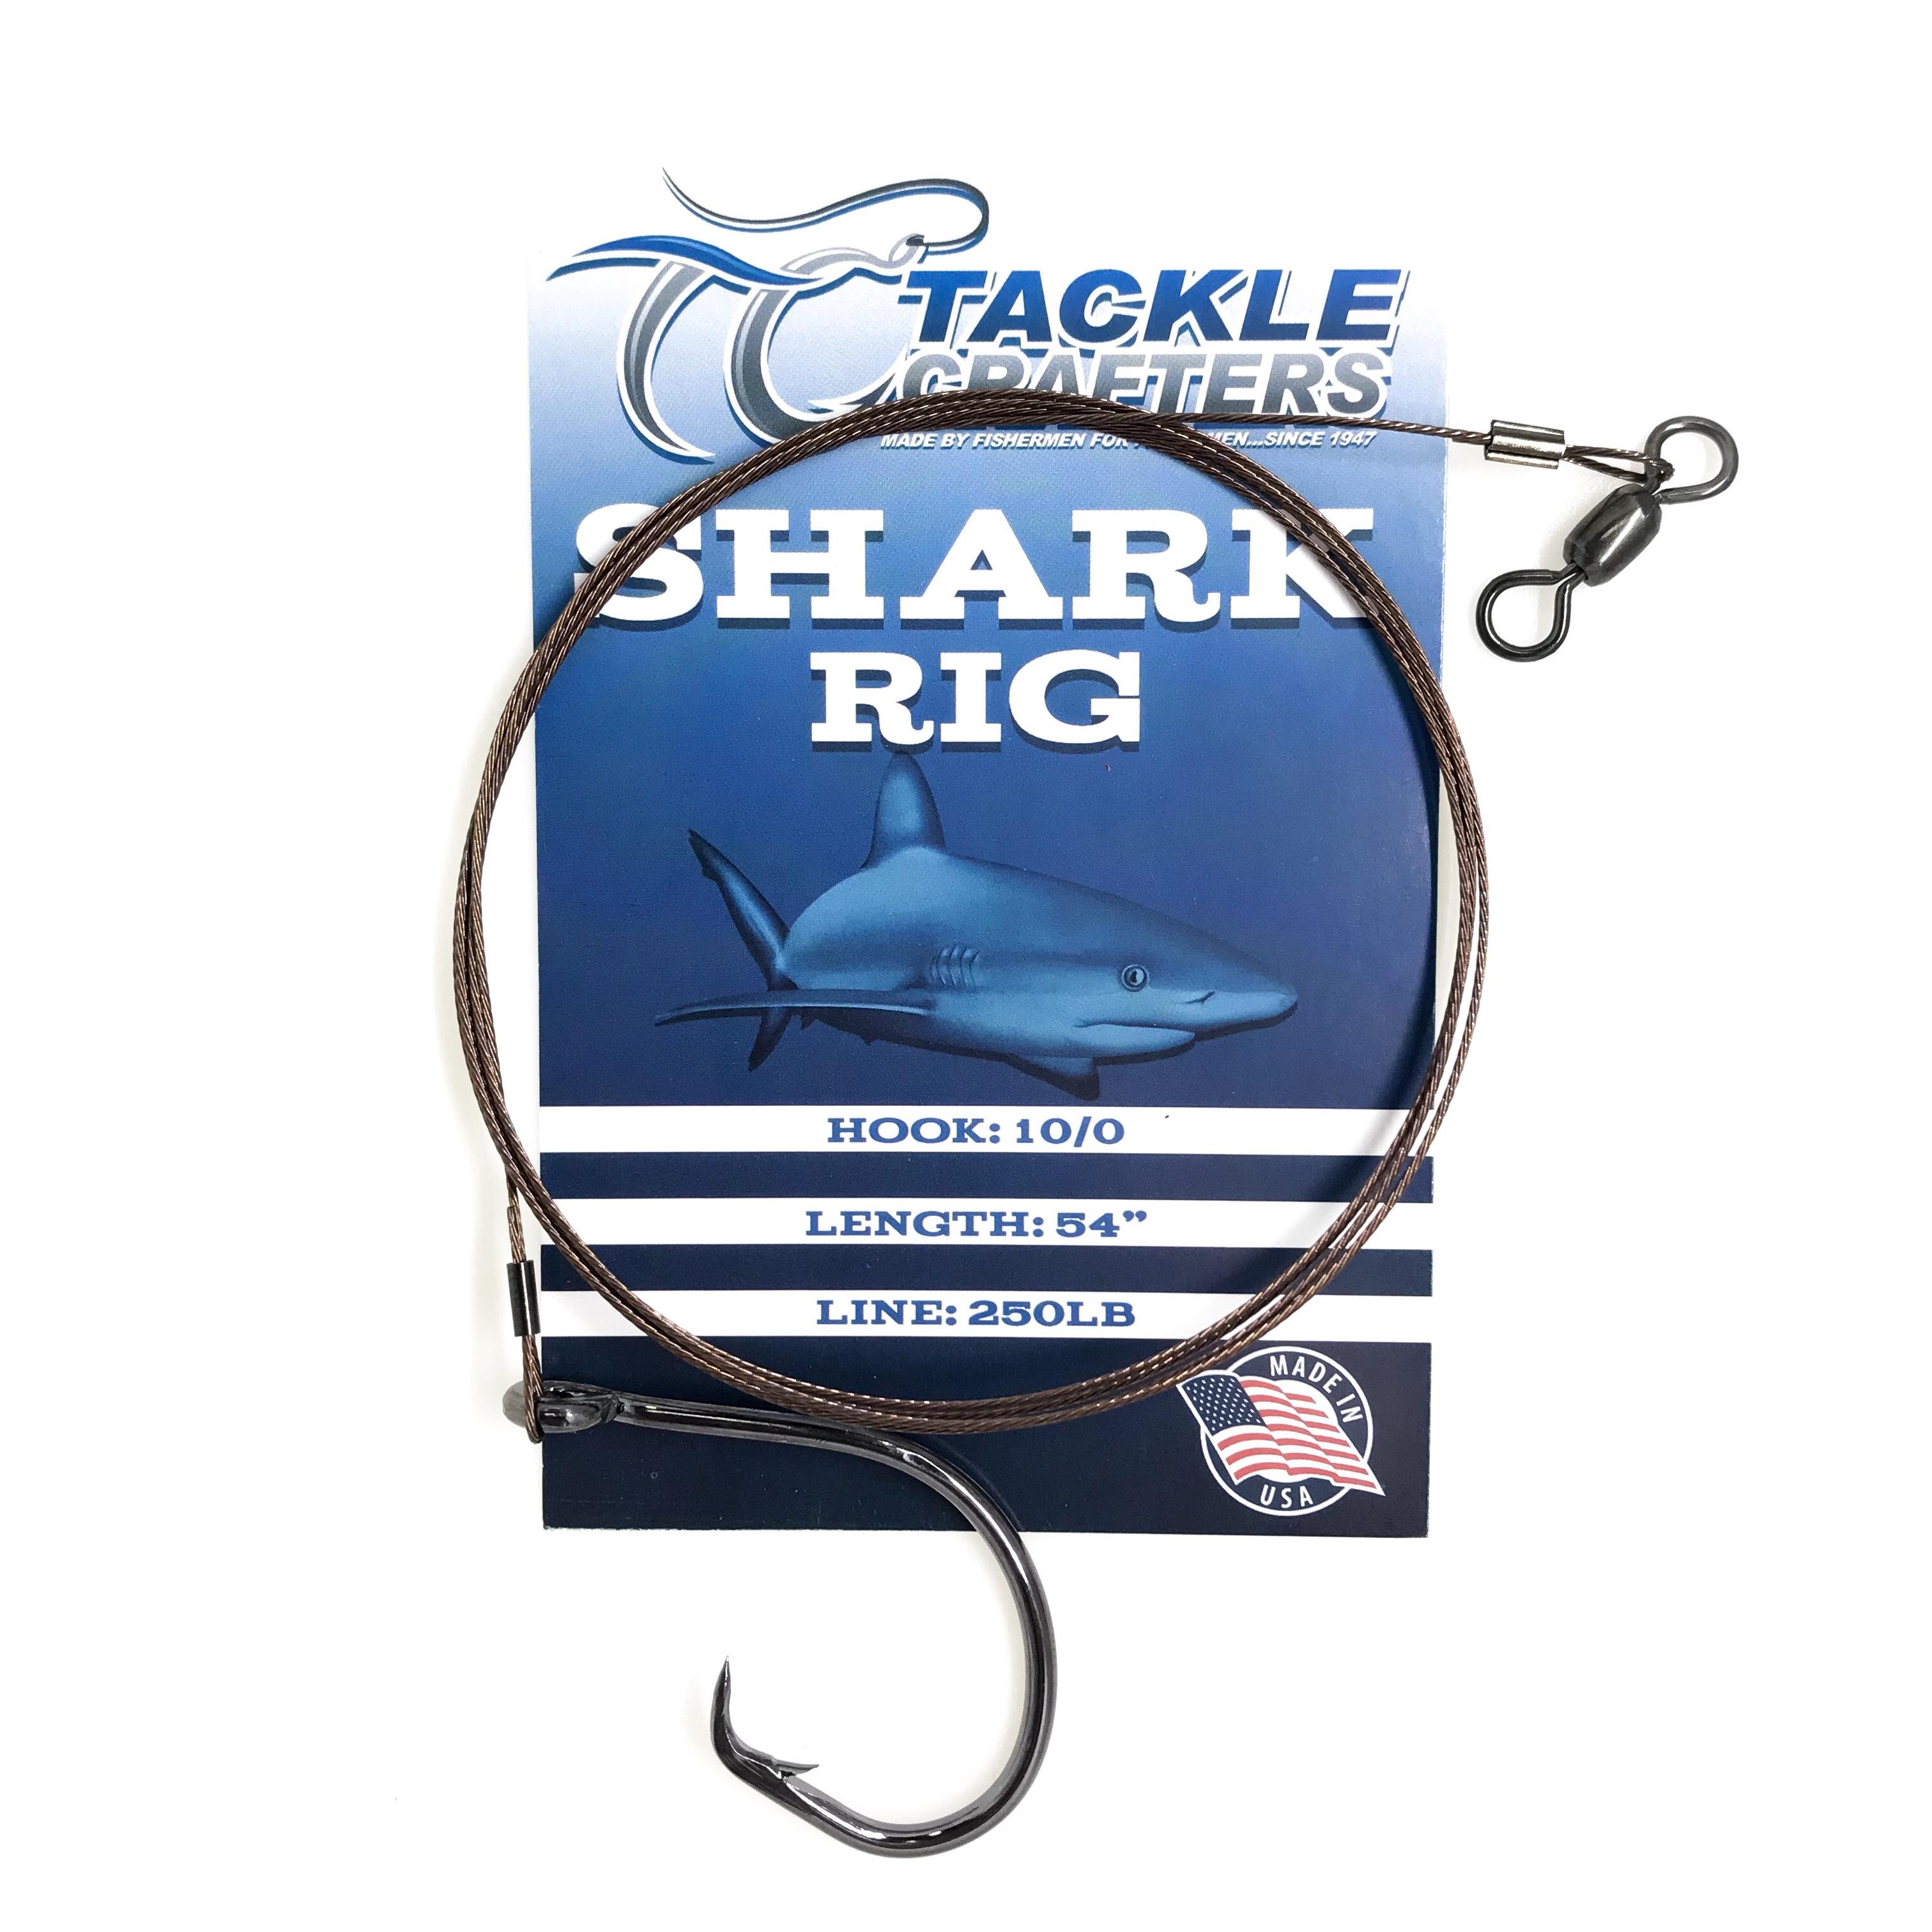 Shark rig 3 pack castable 8//0 circle hooks 90lb 1m 1x3pk Nob Head Fishing Rigs